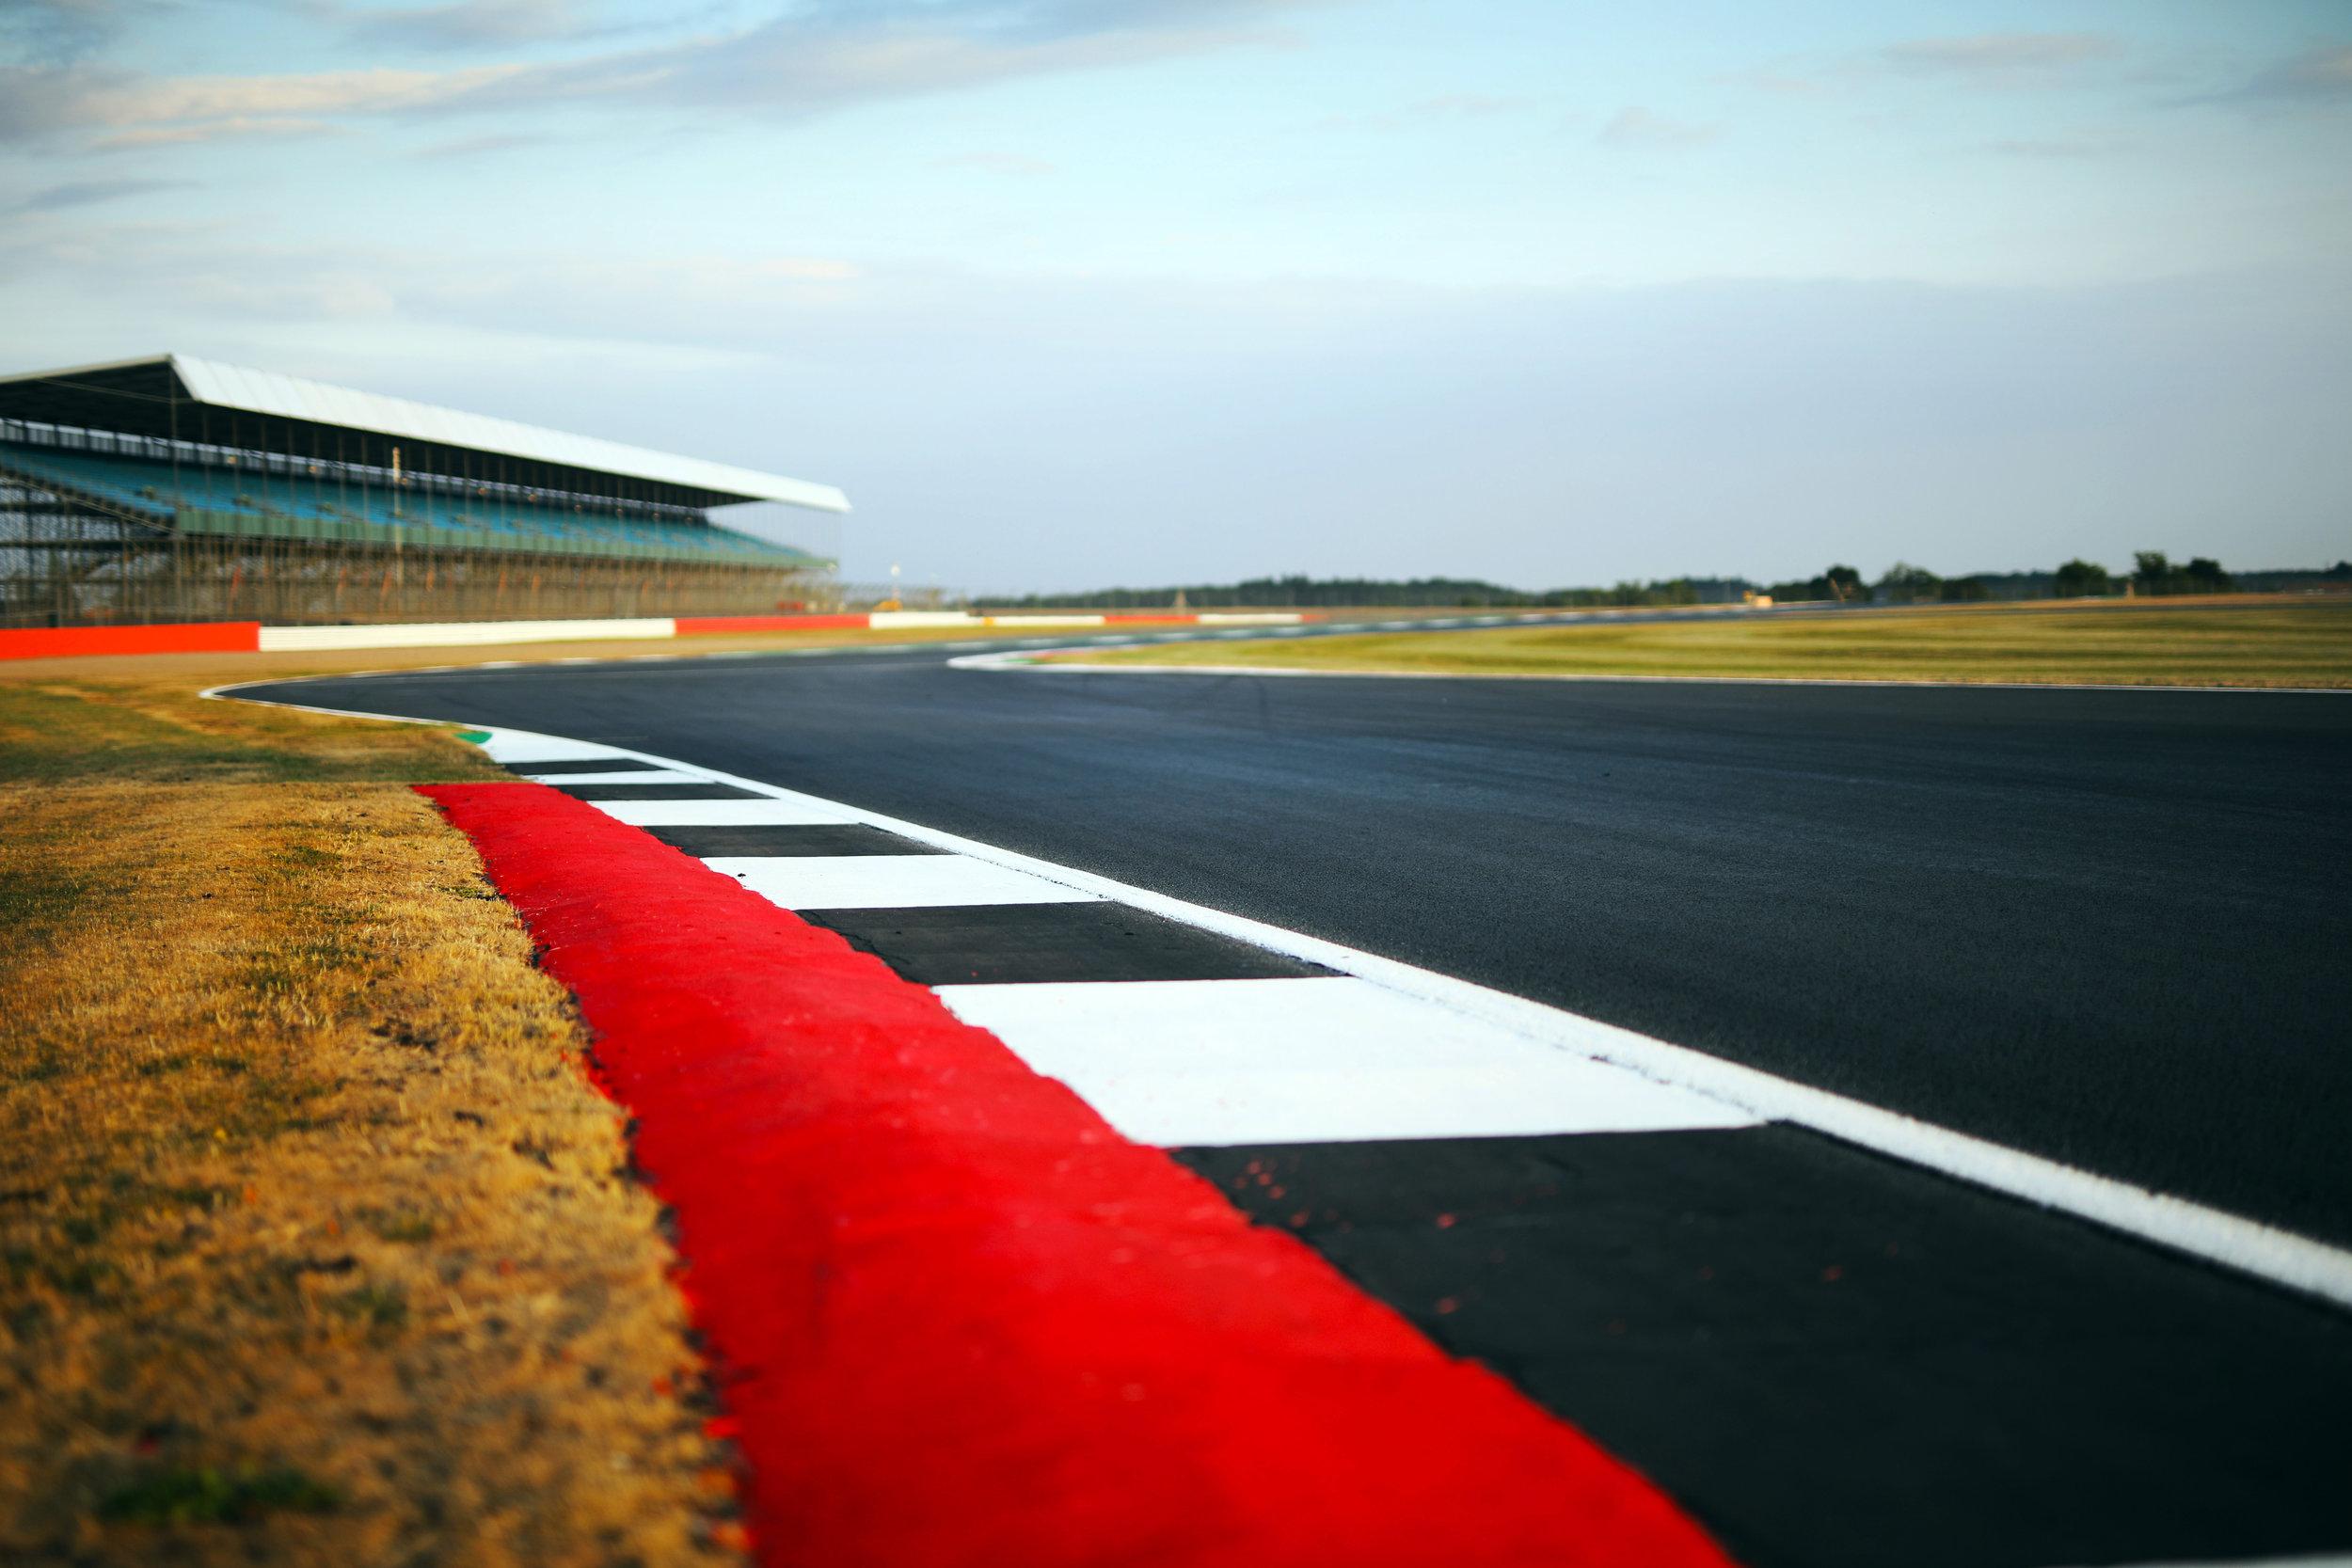 Silverstone Grand Prix Circuit